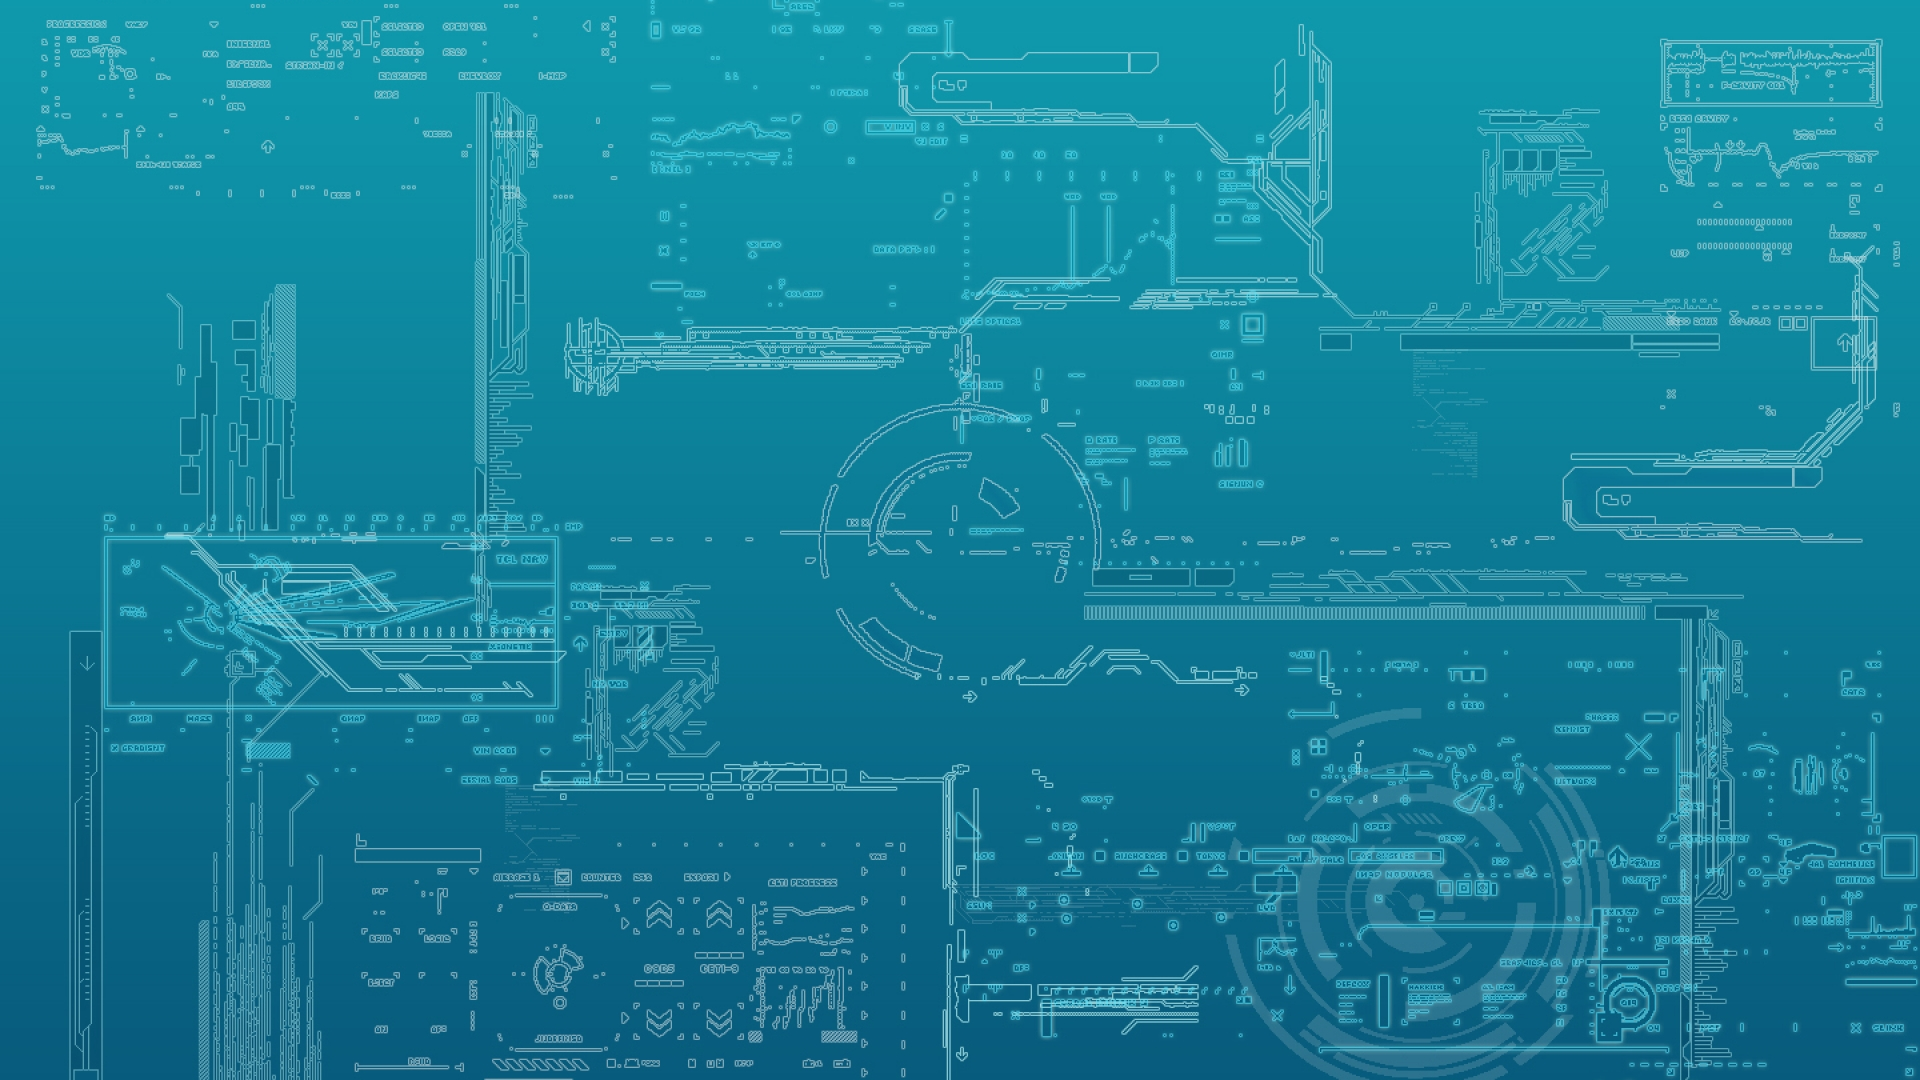 Wiring A Switch Diagram Free Download Wiring Diagram Schematic